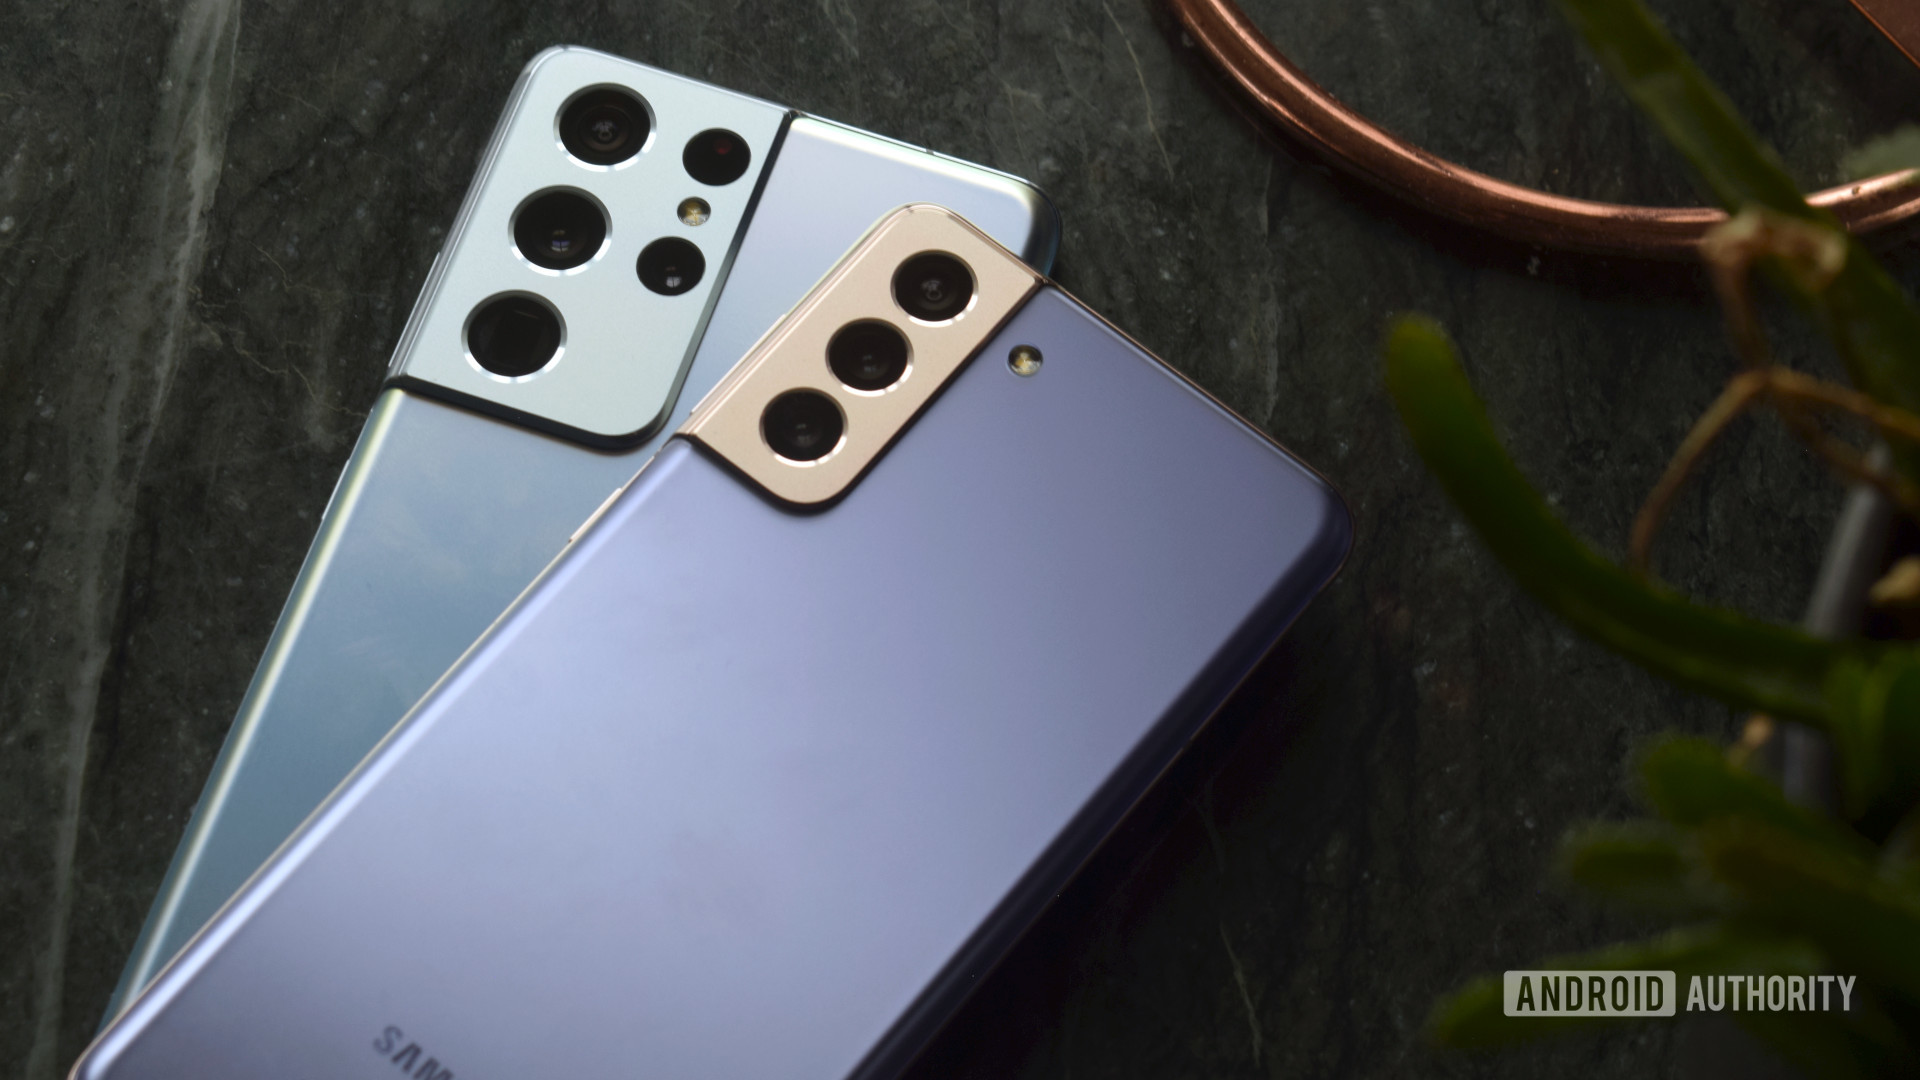 Samsung Galaxy S21 Ultra vs Galaxy S21 Plus backs